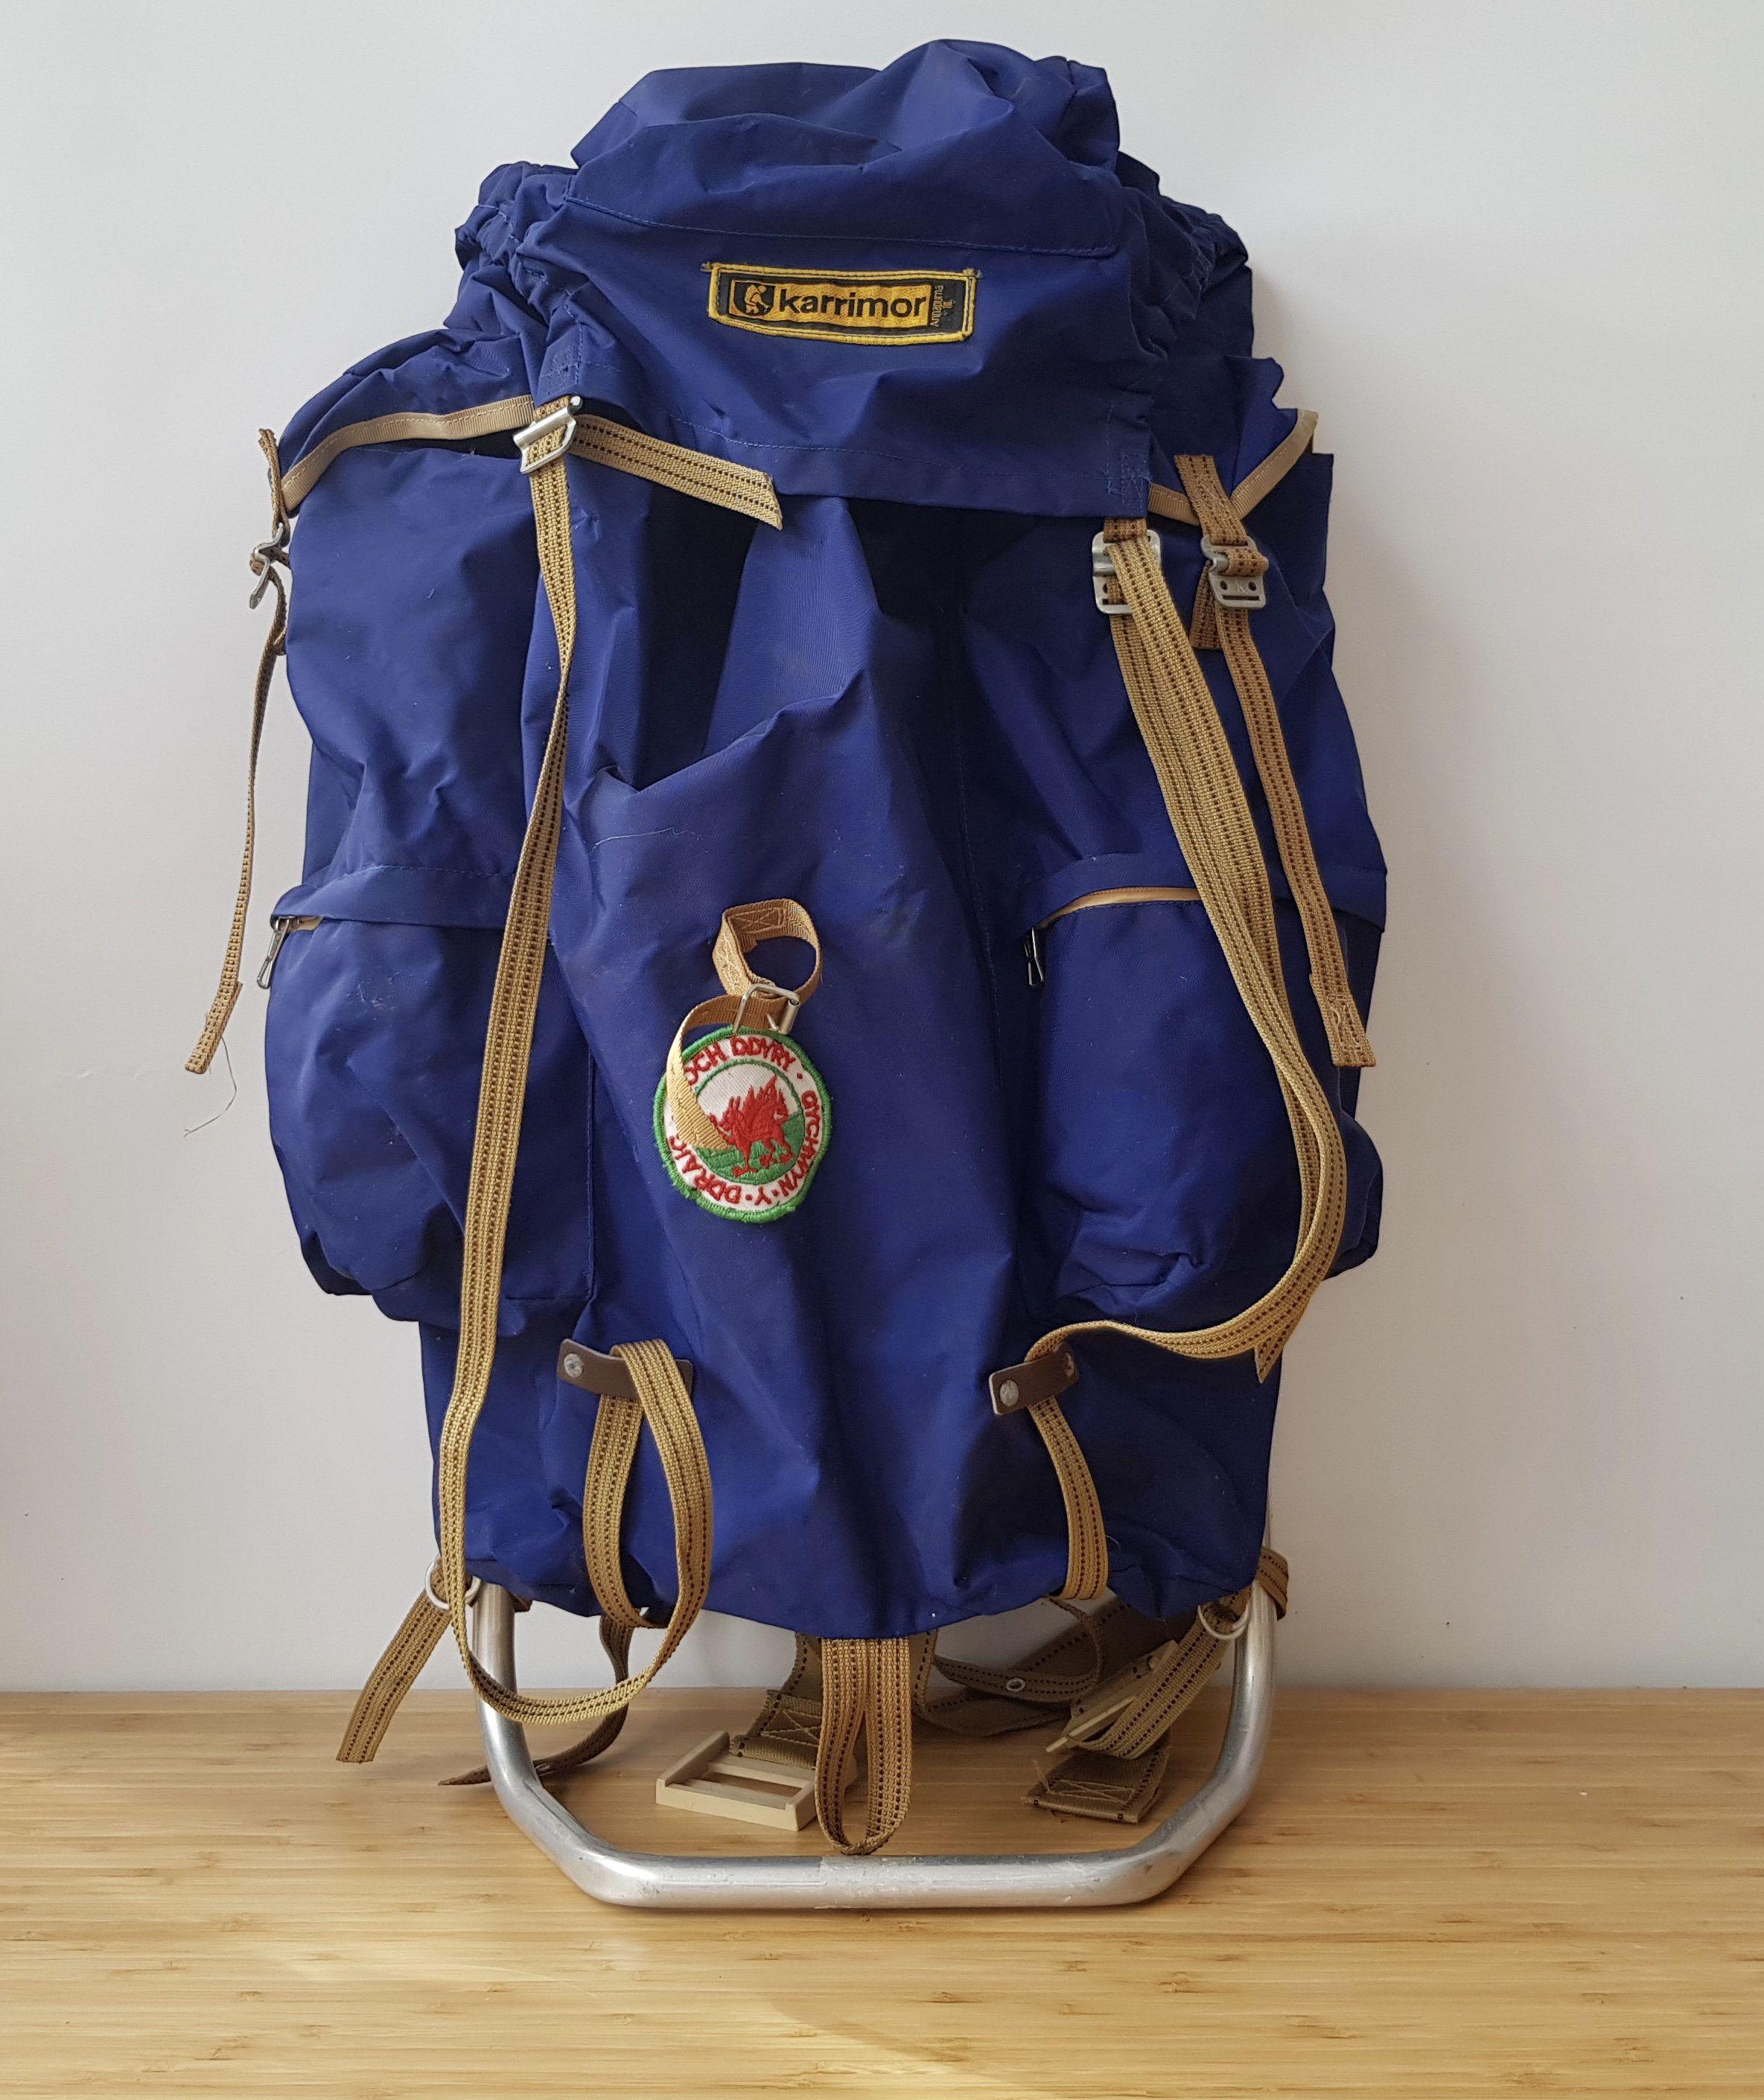 7e27d7178ea9 Vintage Blue Karrimor Rucksack Old Rucksack Old Hiking Bag Old Hiking  Rucksack Old Camping Accessories by Route46Vintage on Etsy